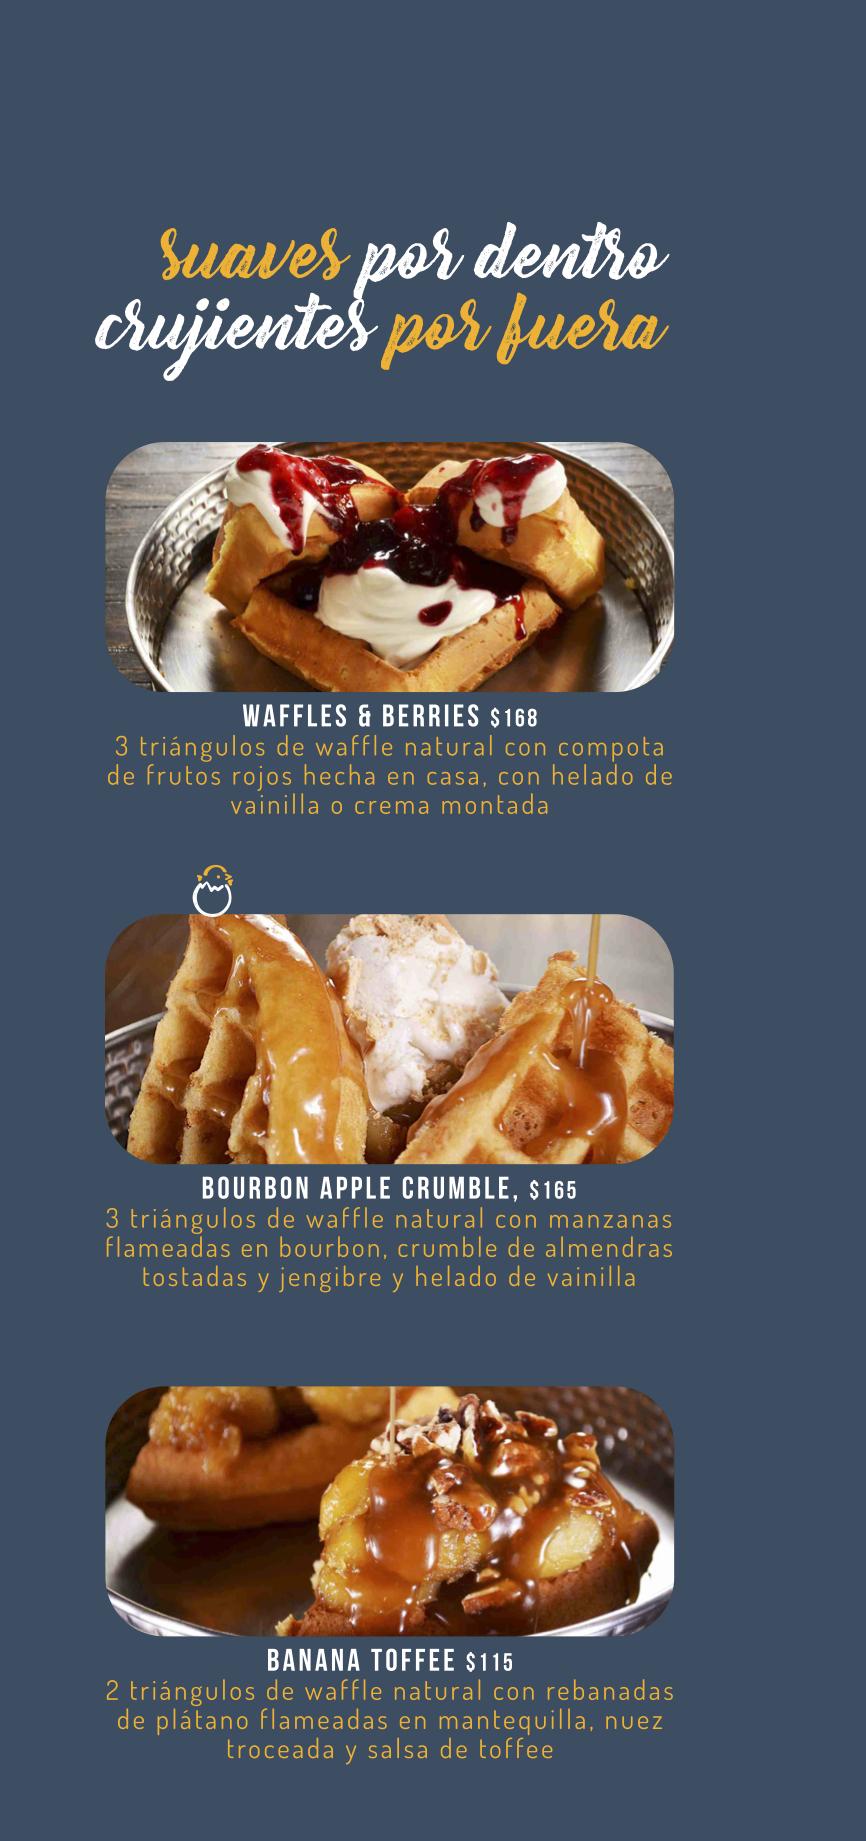 Jaxsons.menu.2019-8.jpg